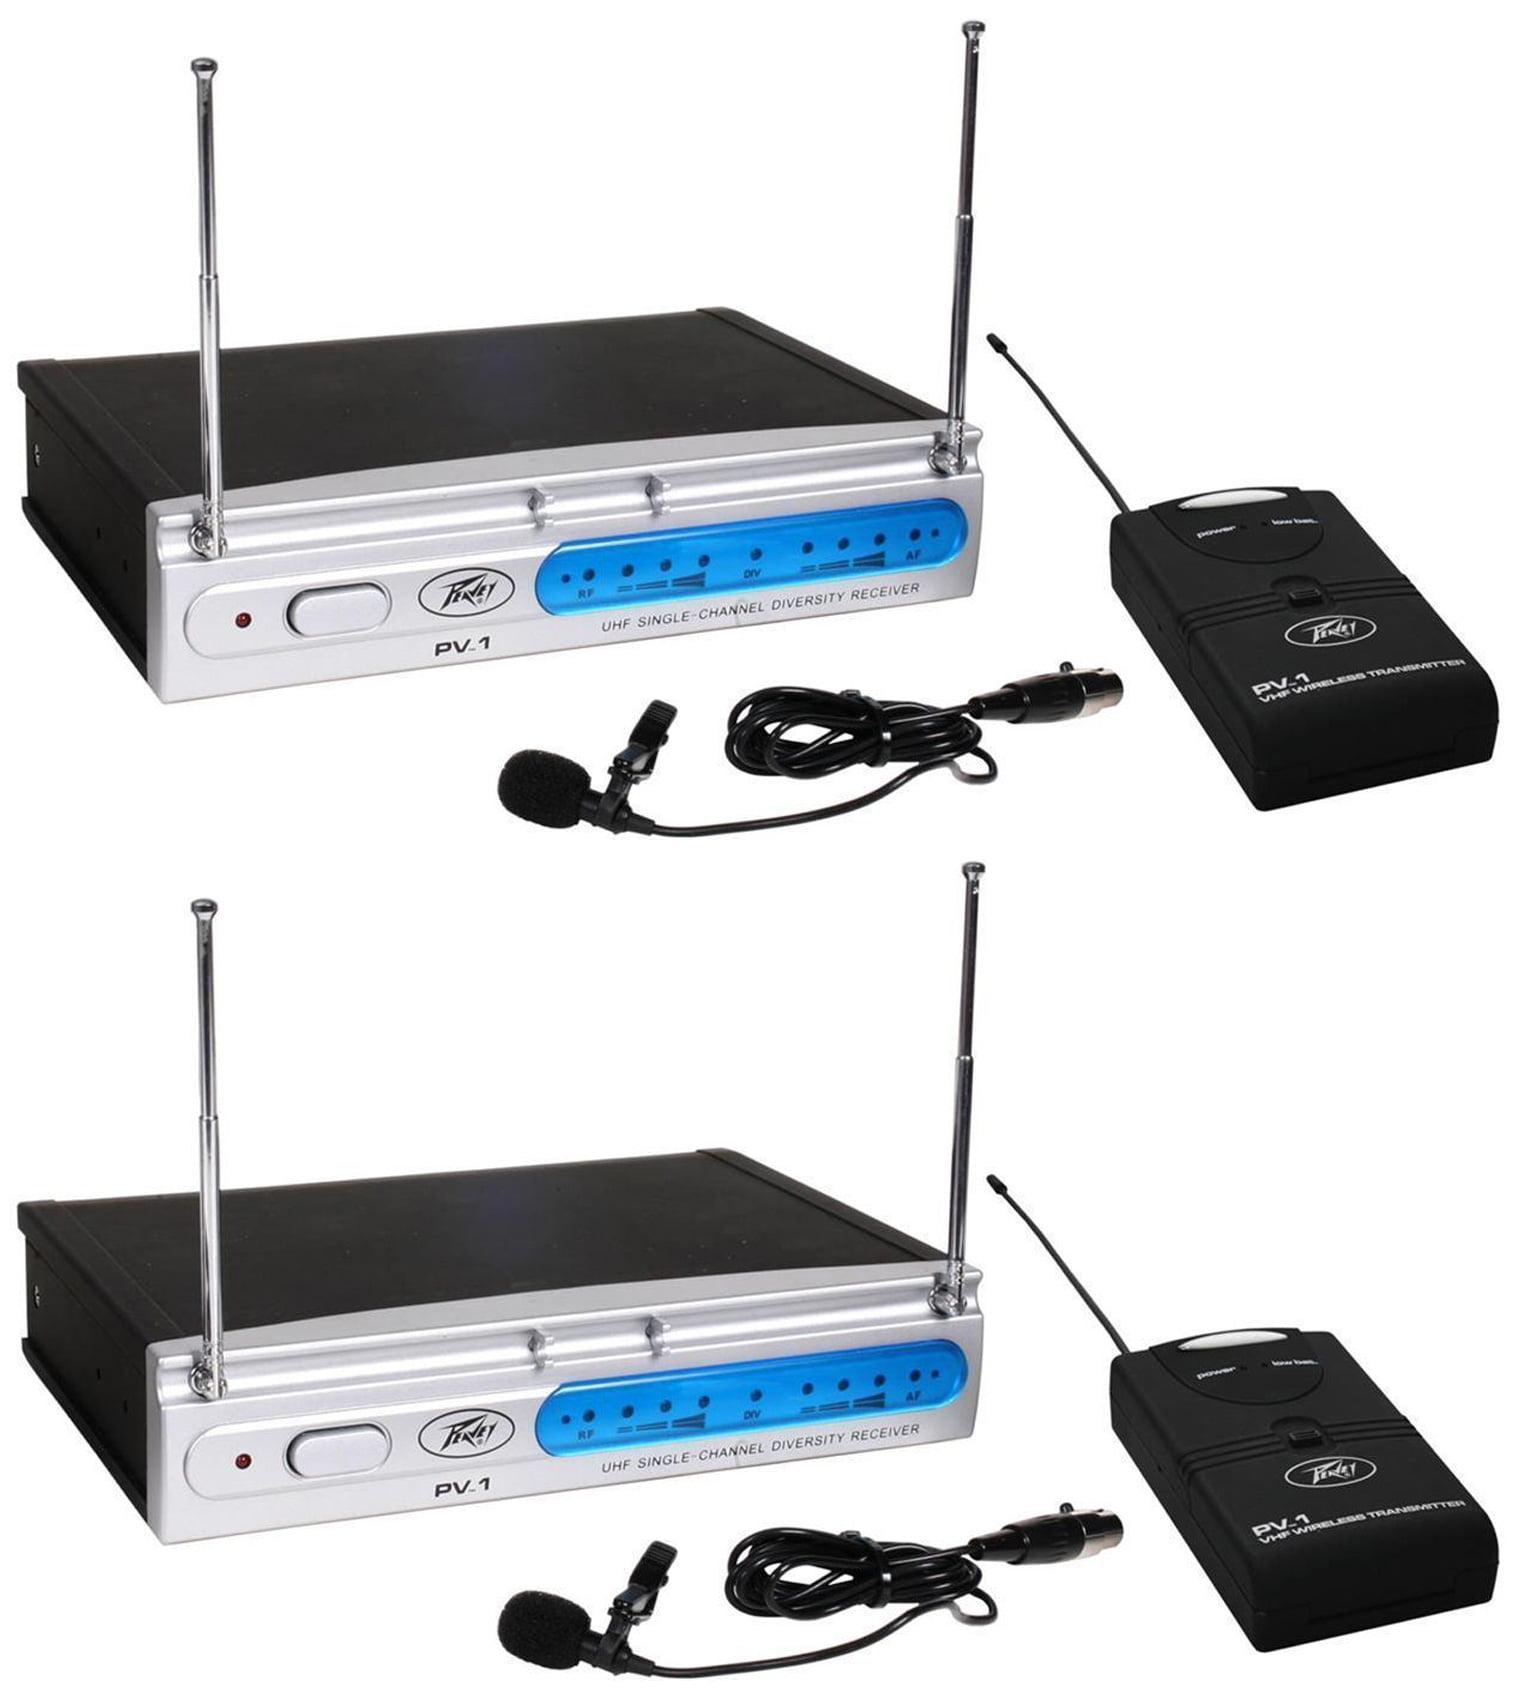 (2) Peavey PV-1 V1 BL 203.400 MHZ VHF Wireless Lavalier Microphone Systems